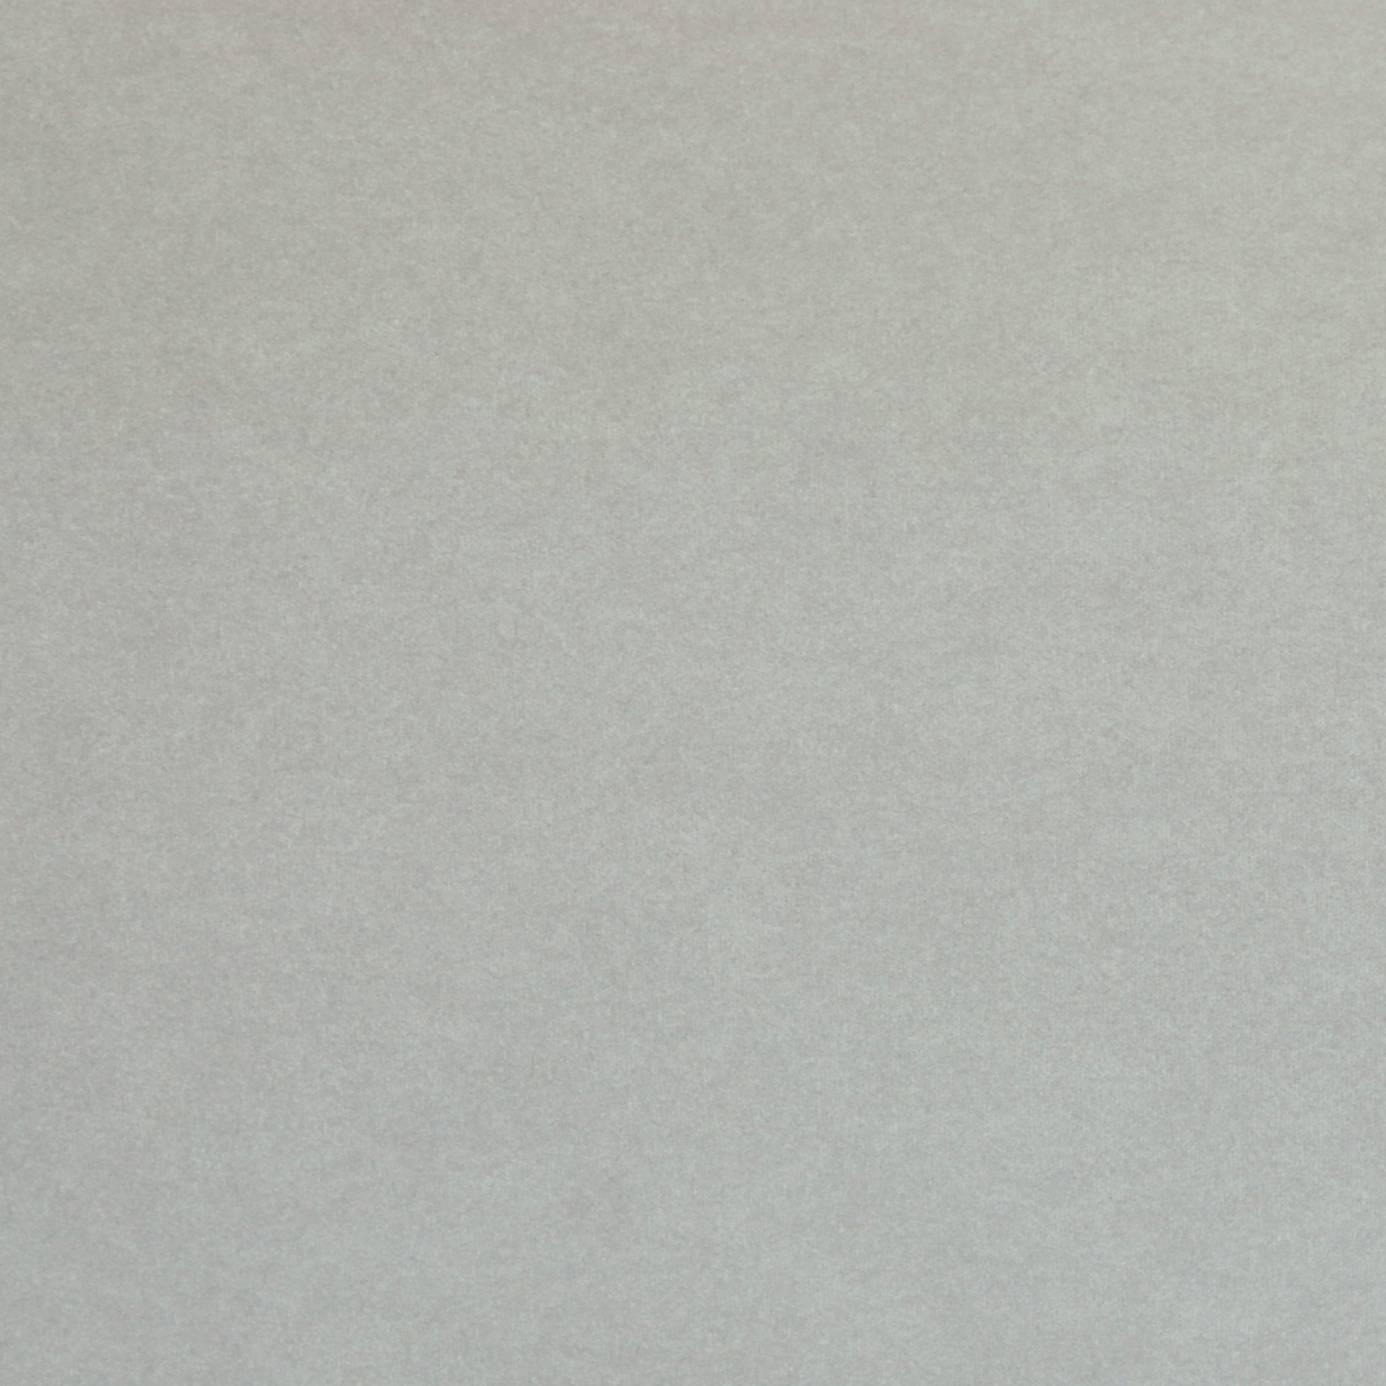 Французские обои Casadeco,  коллекция So White 2, артикулSWI13219424